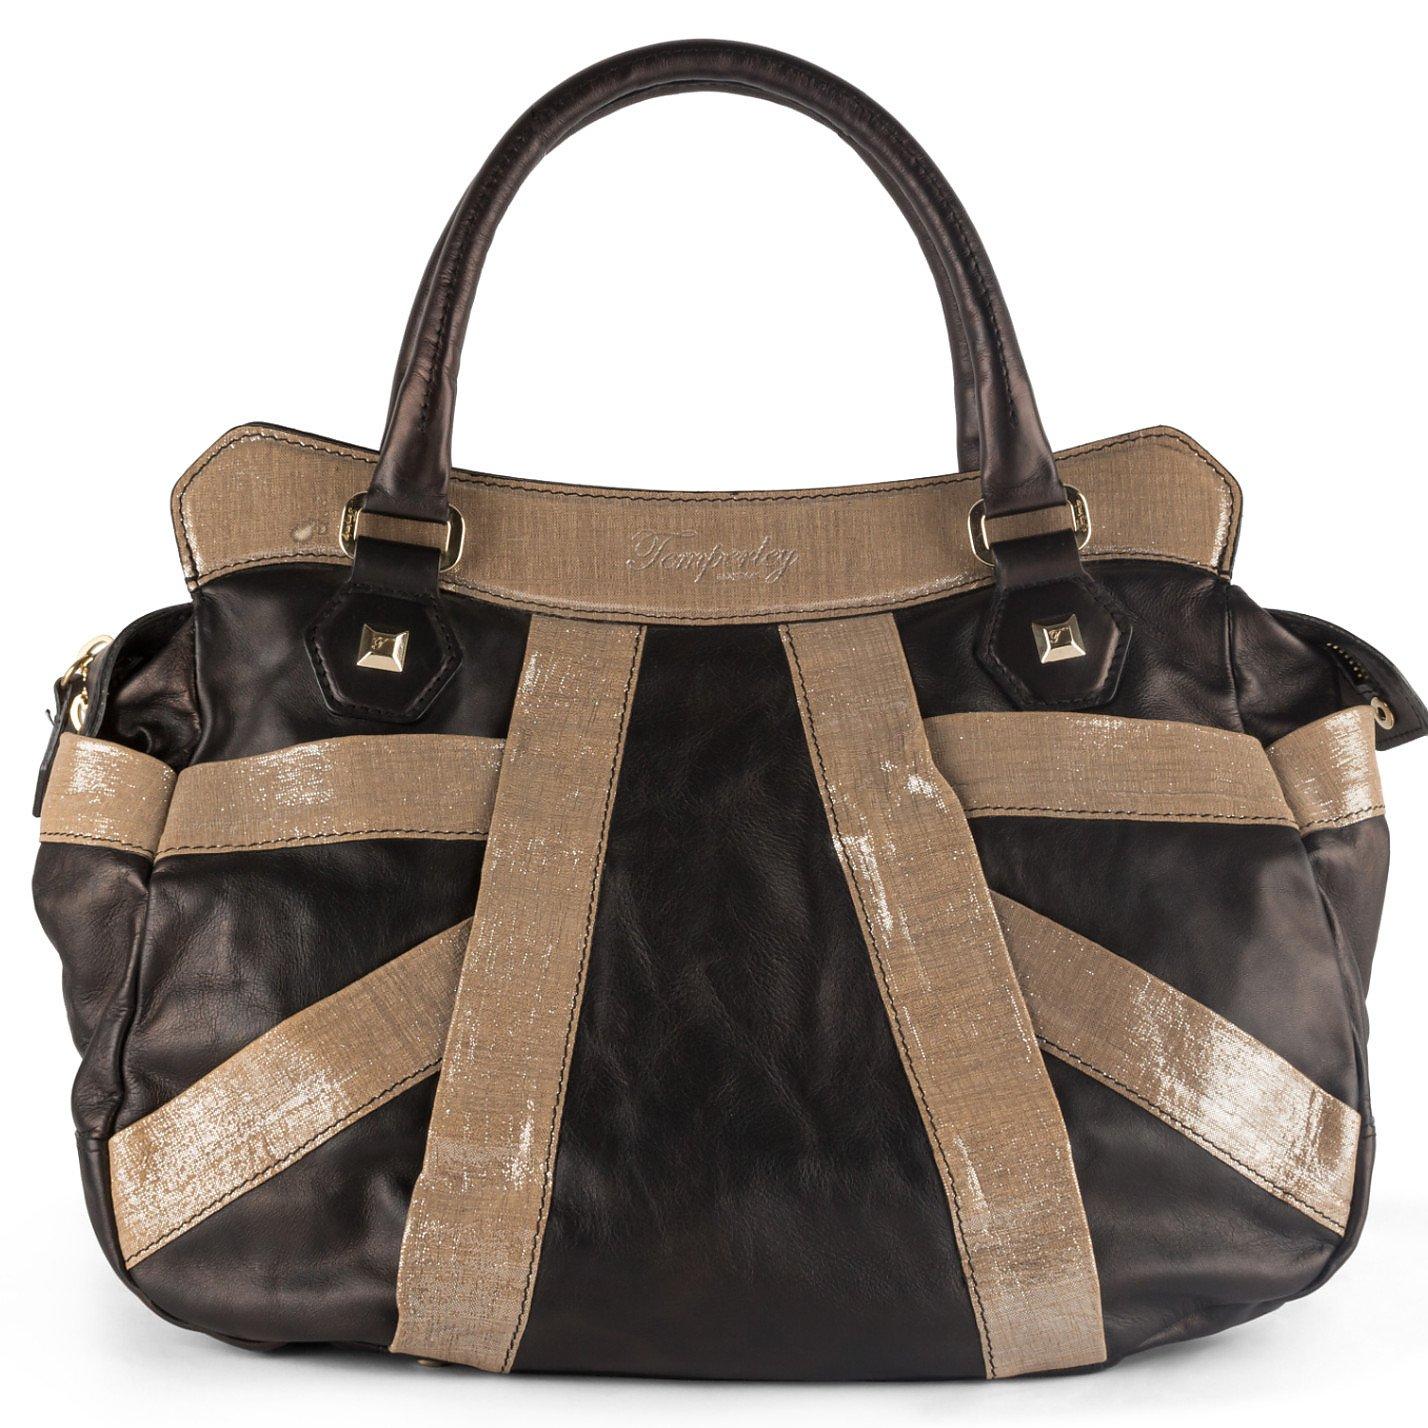 Temperley London Leather Handbag